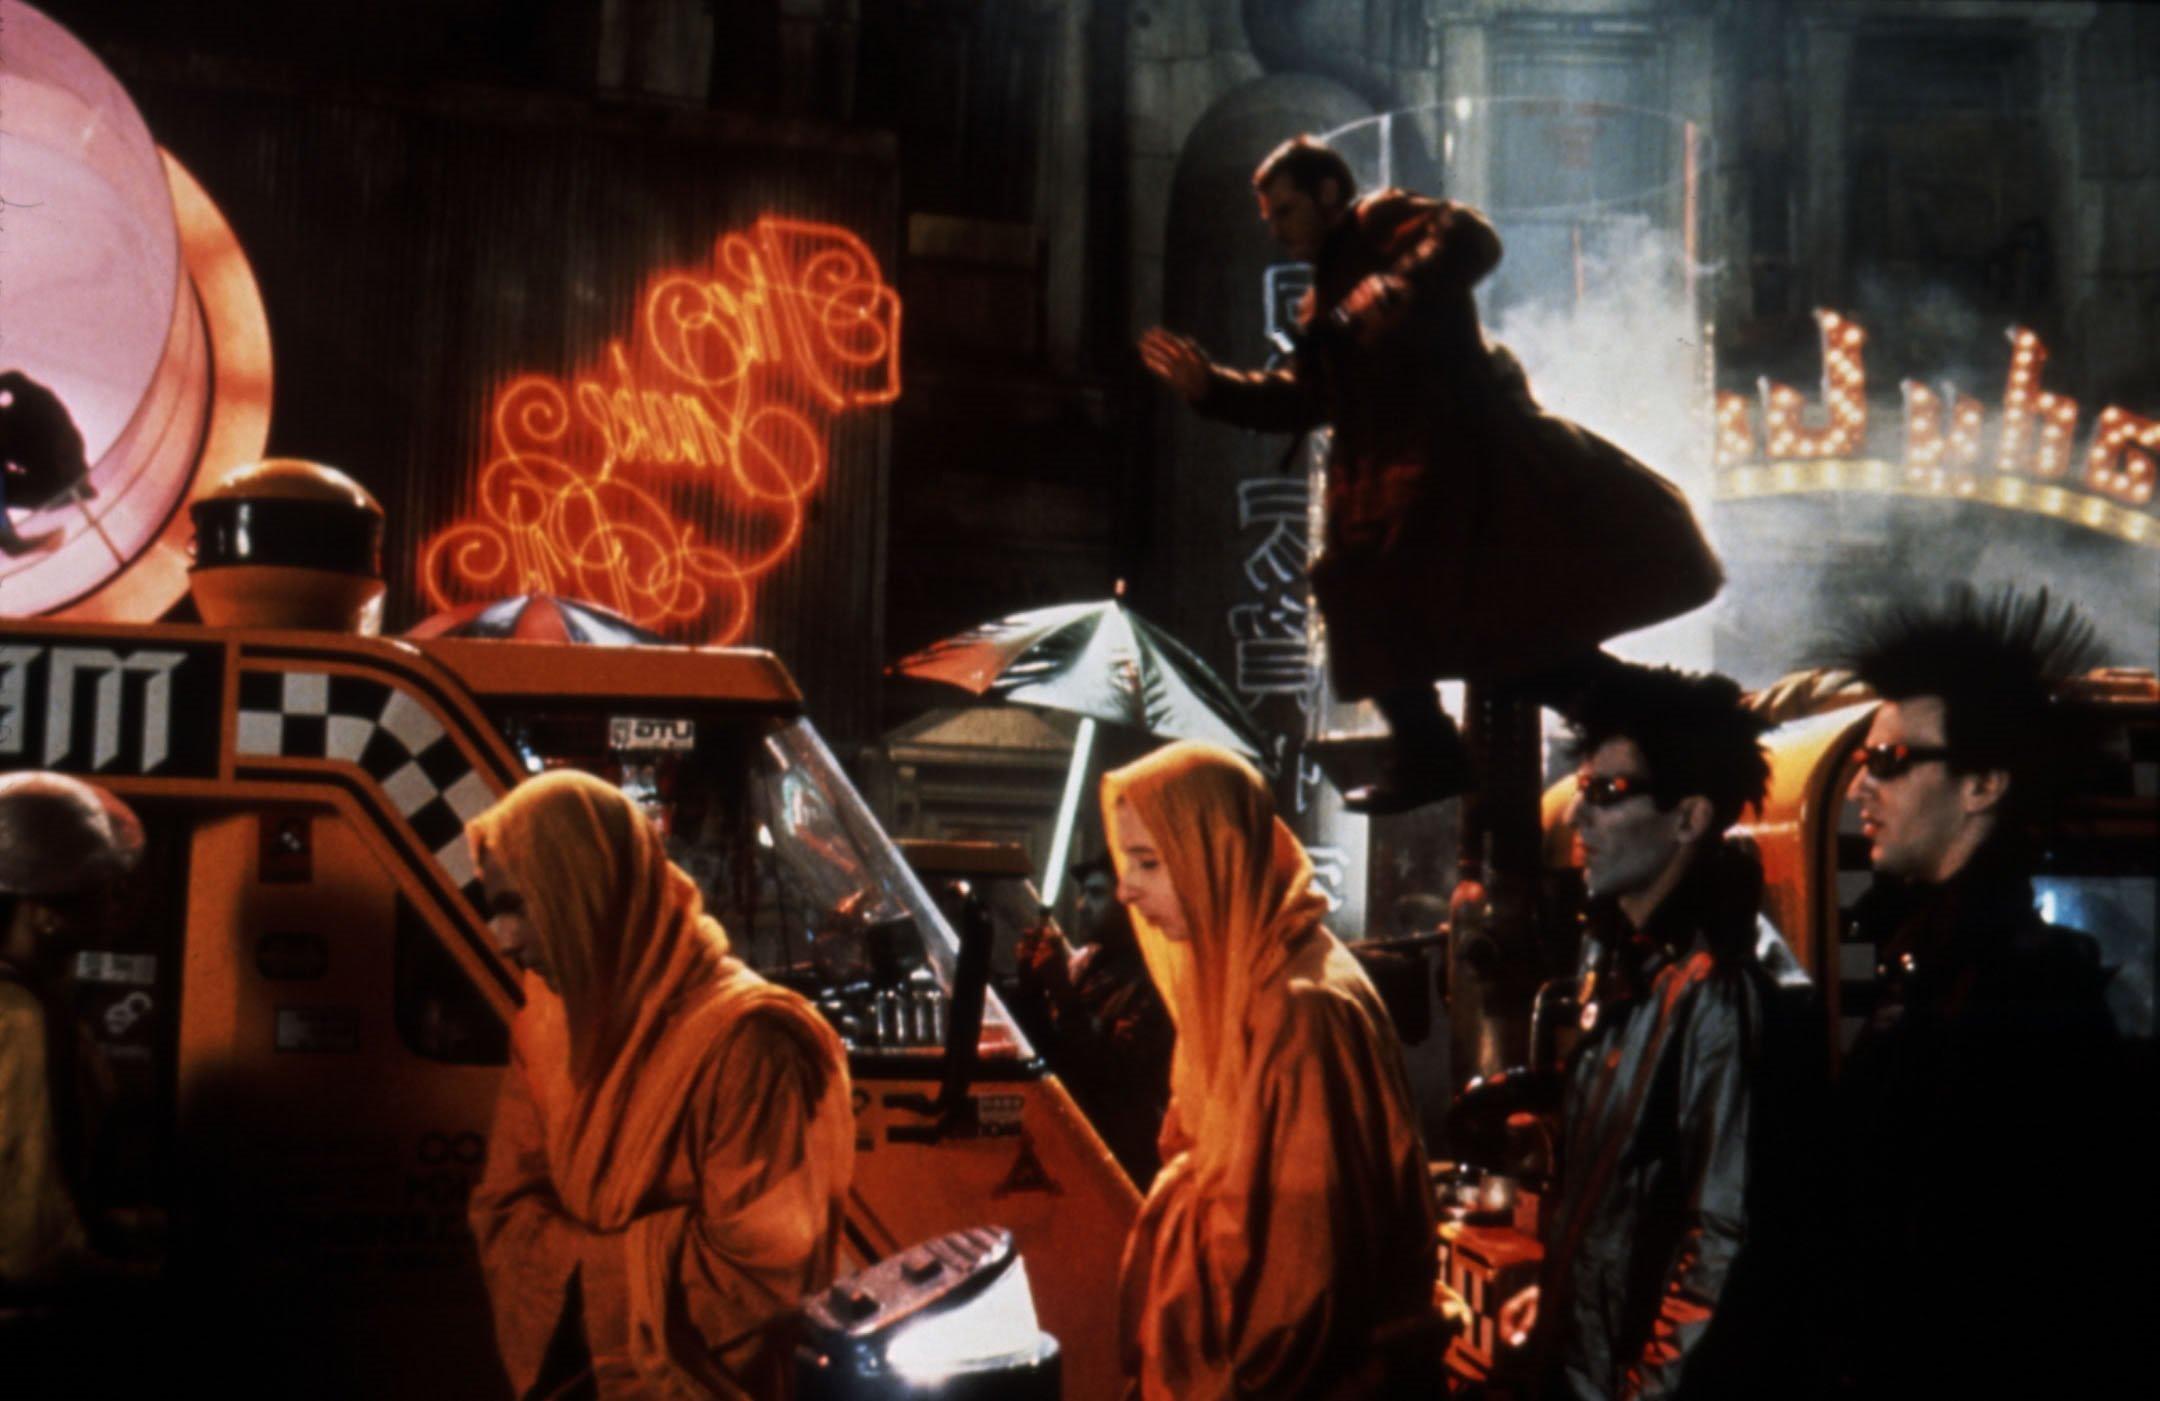 https://i2.wp.com/images2.fanpop.com/images/photos/8200000/Harrison-Ford-as-Deckard-in-Bladerunner-blade-runner-8243054-2160-1401.jpg